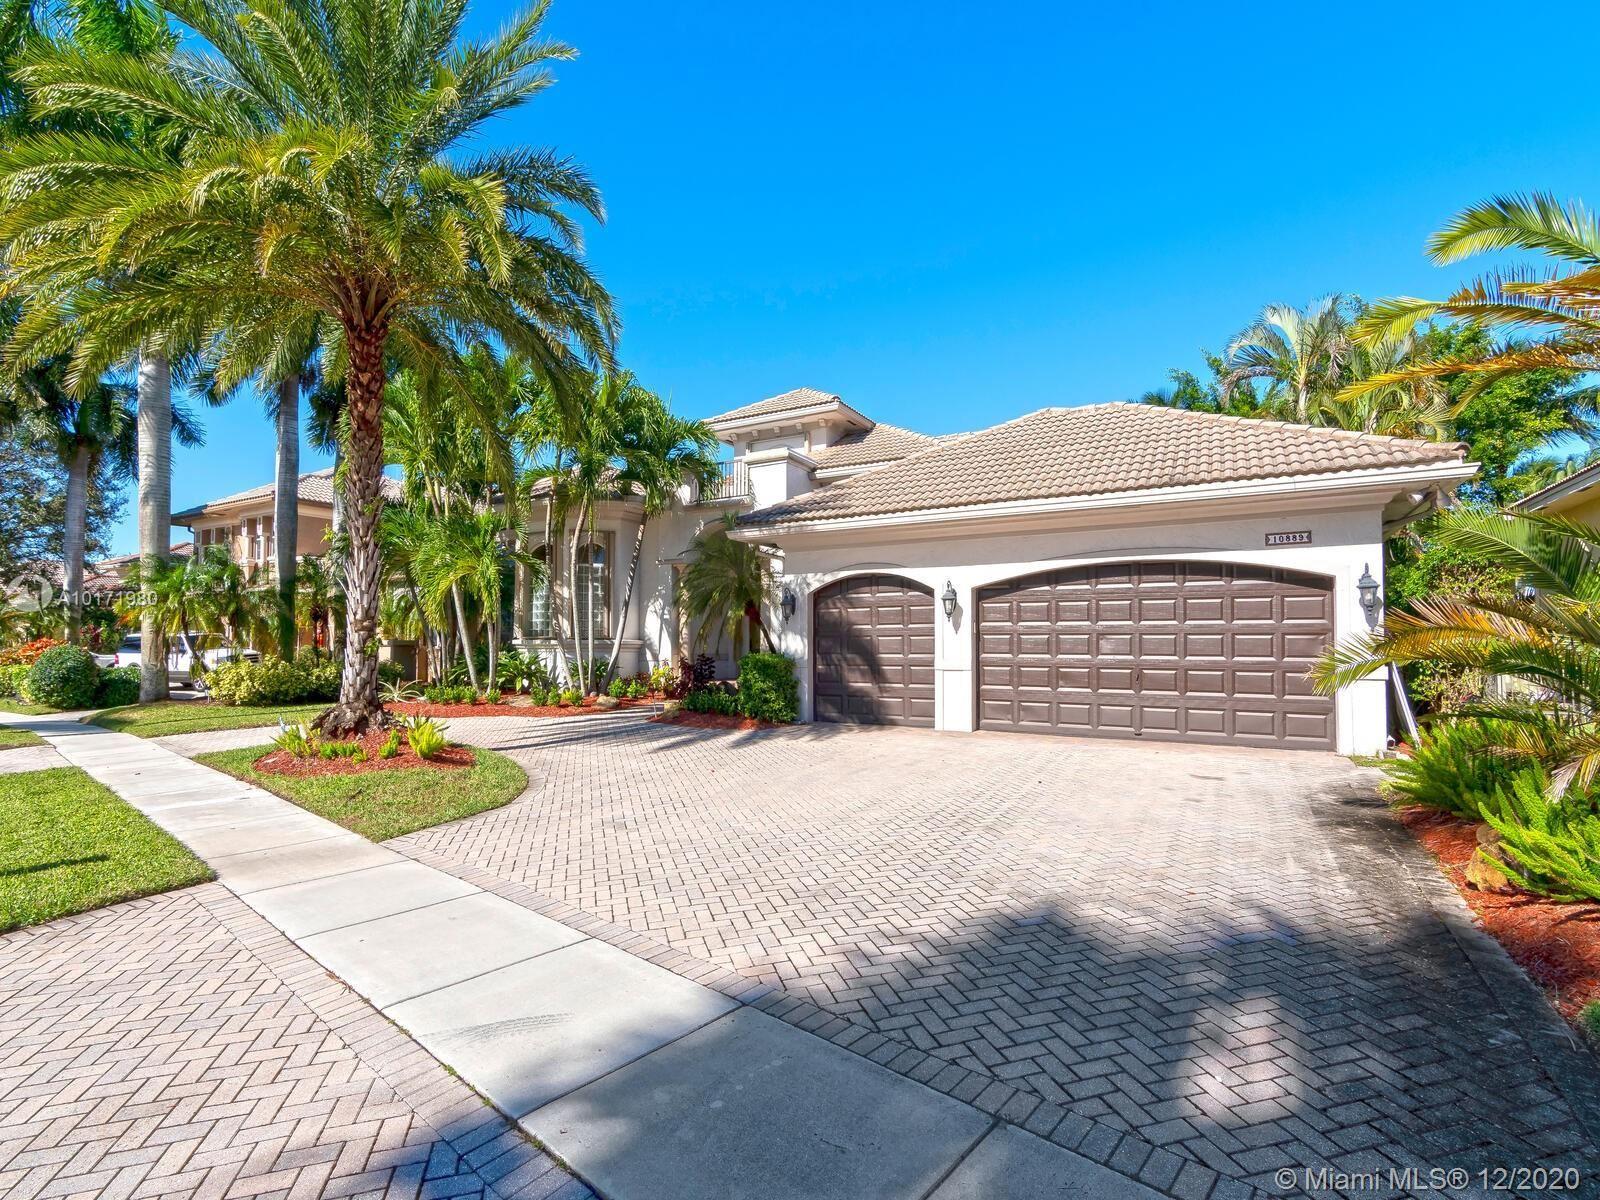 10889 Blue Palm St, Plantation, FL 33324 - MLS#: A10171980